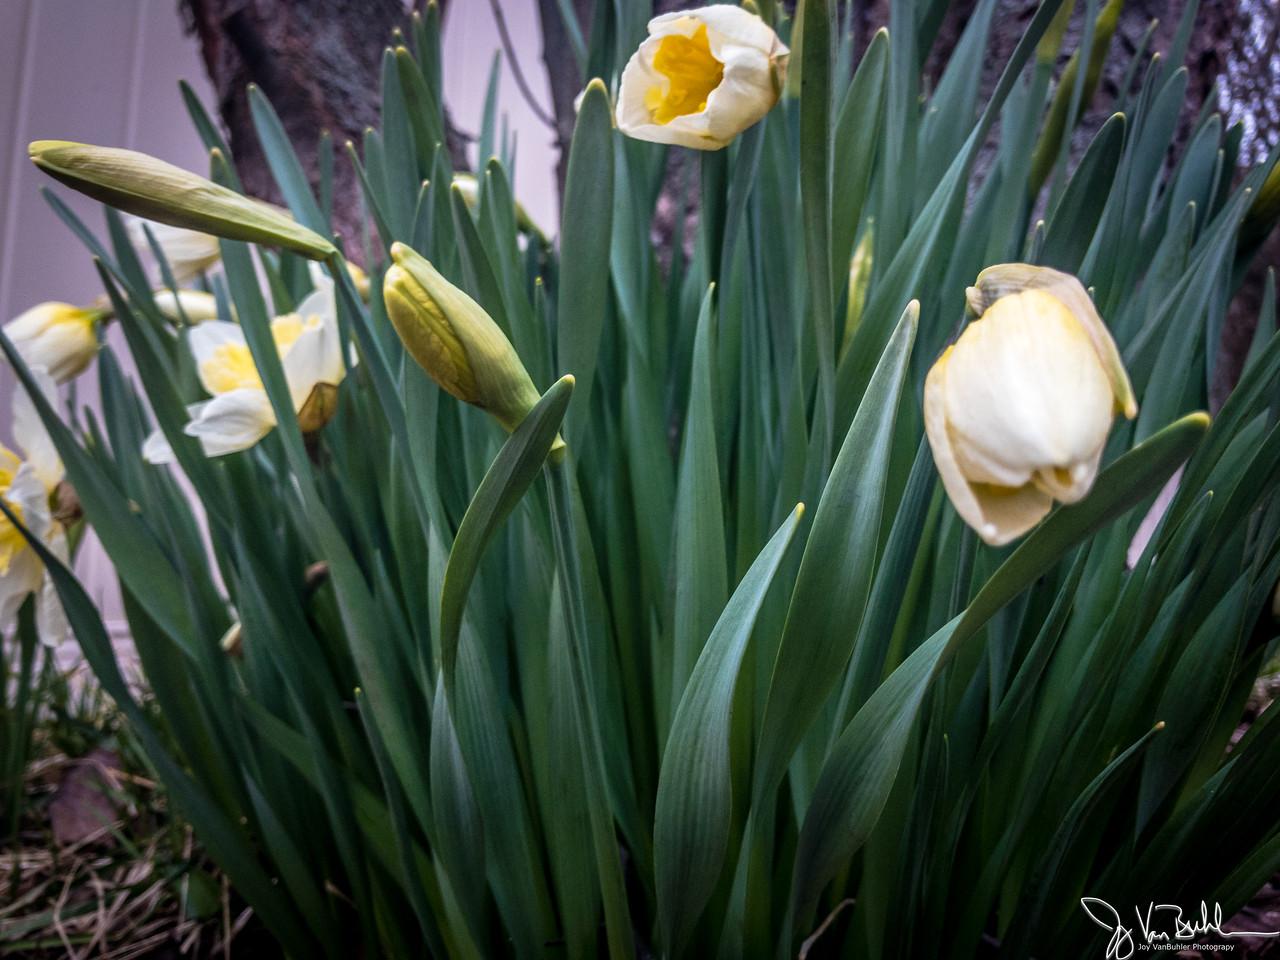 93/365 - Tulips